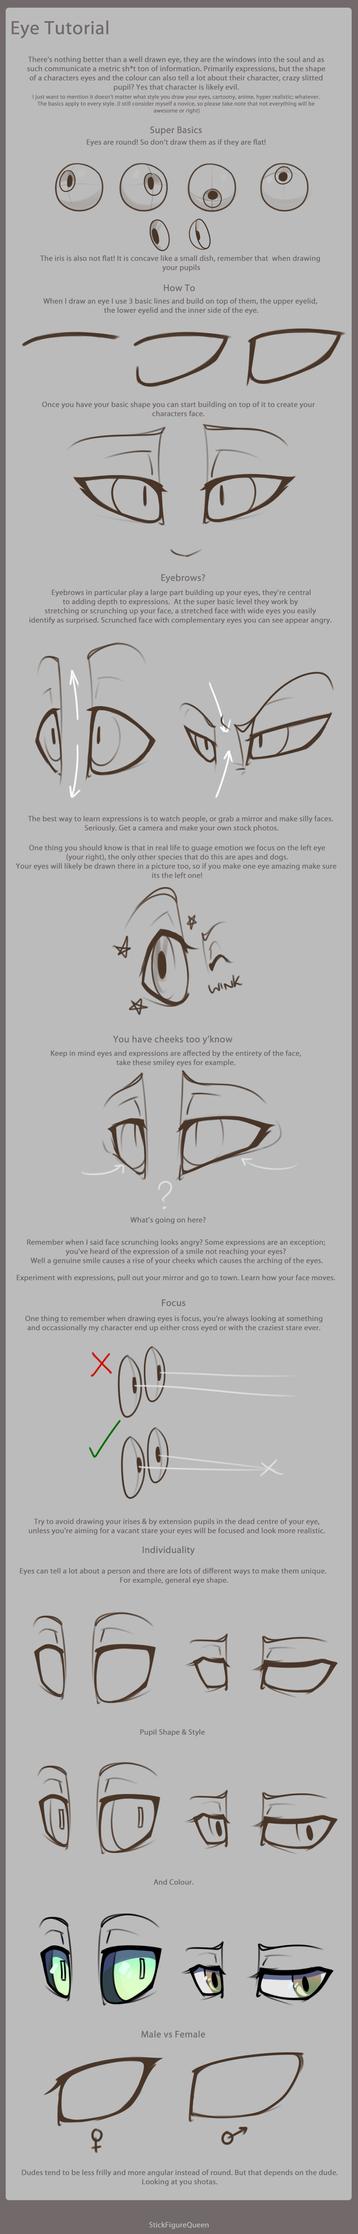 Eye Tutorial by Stickaroo